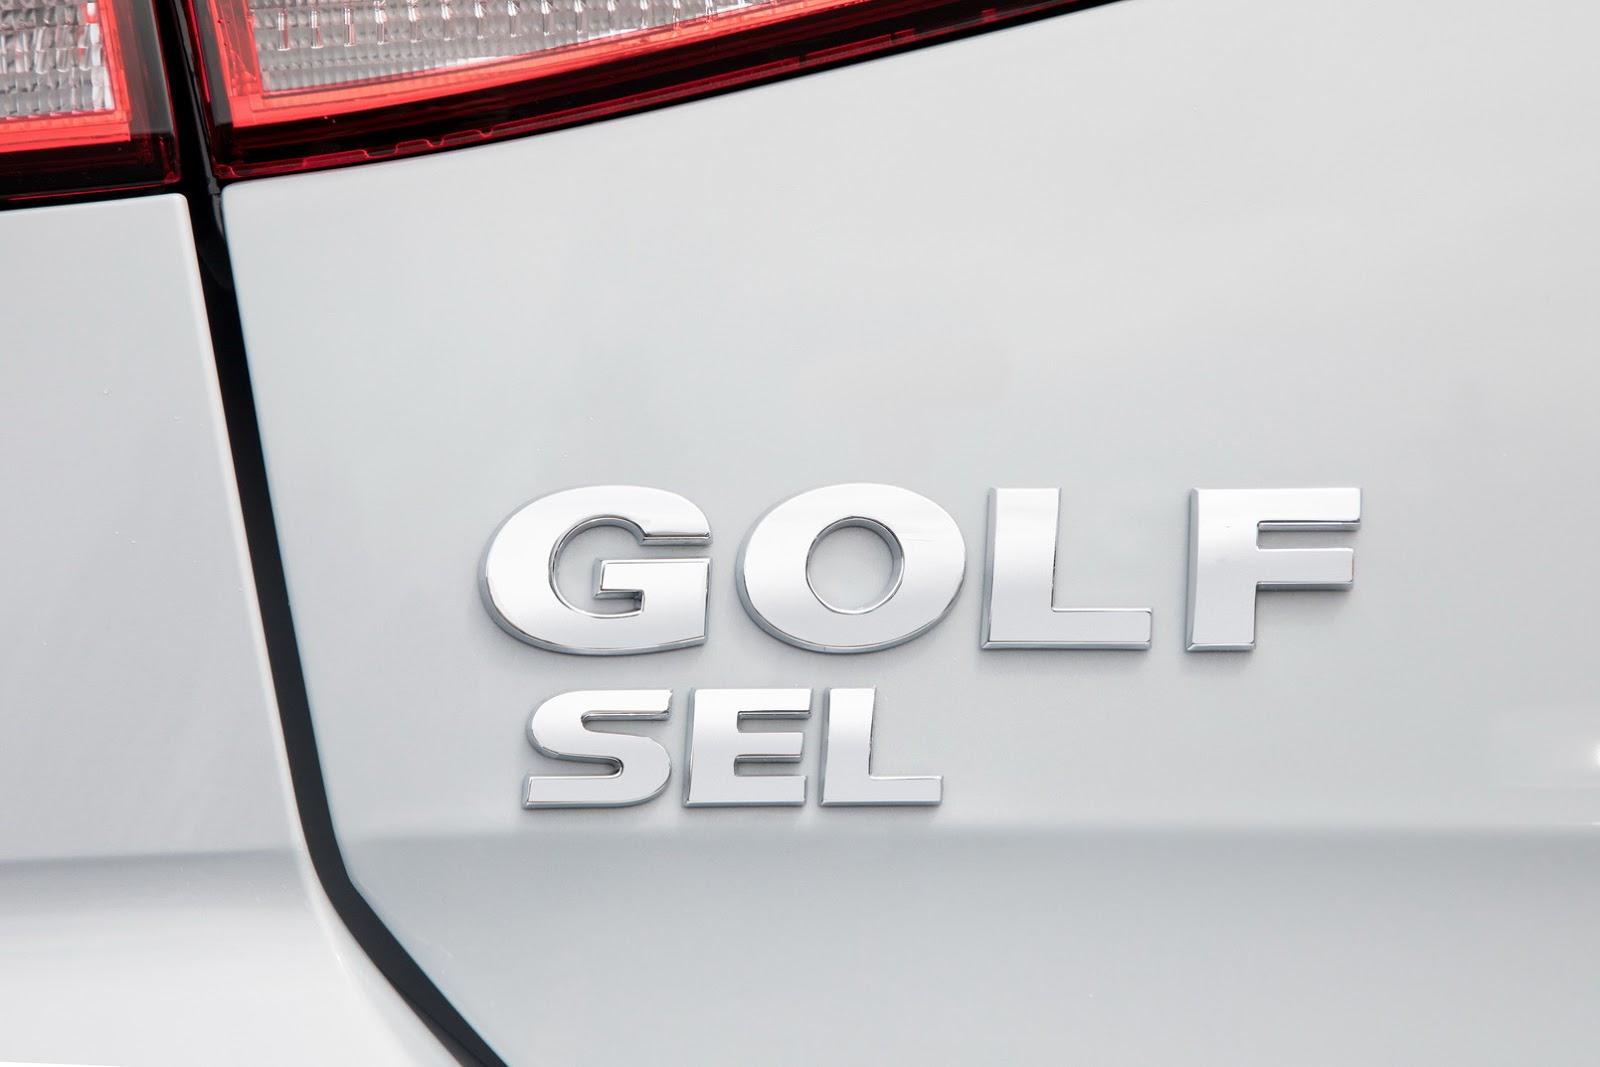 2018-VW-Golf-14